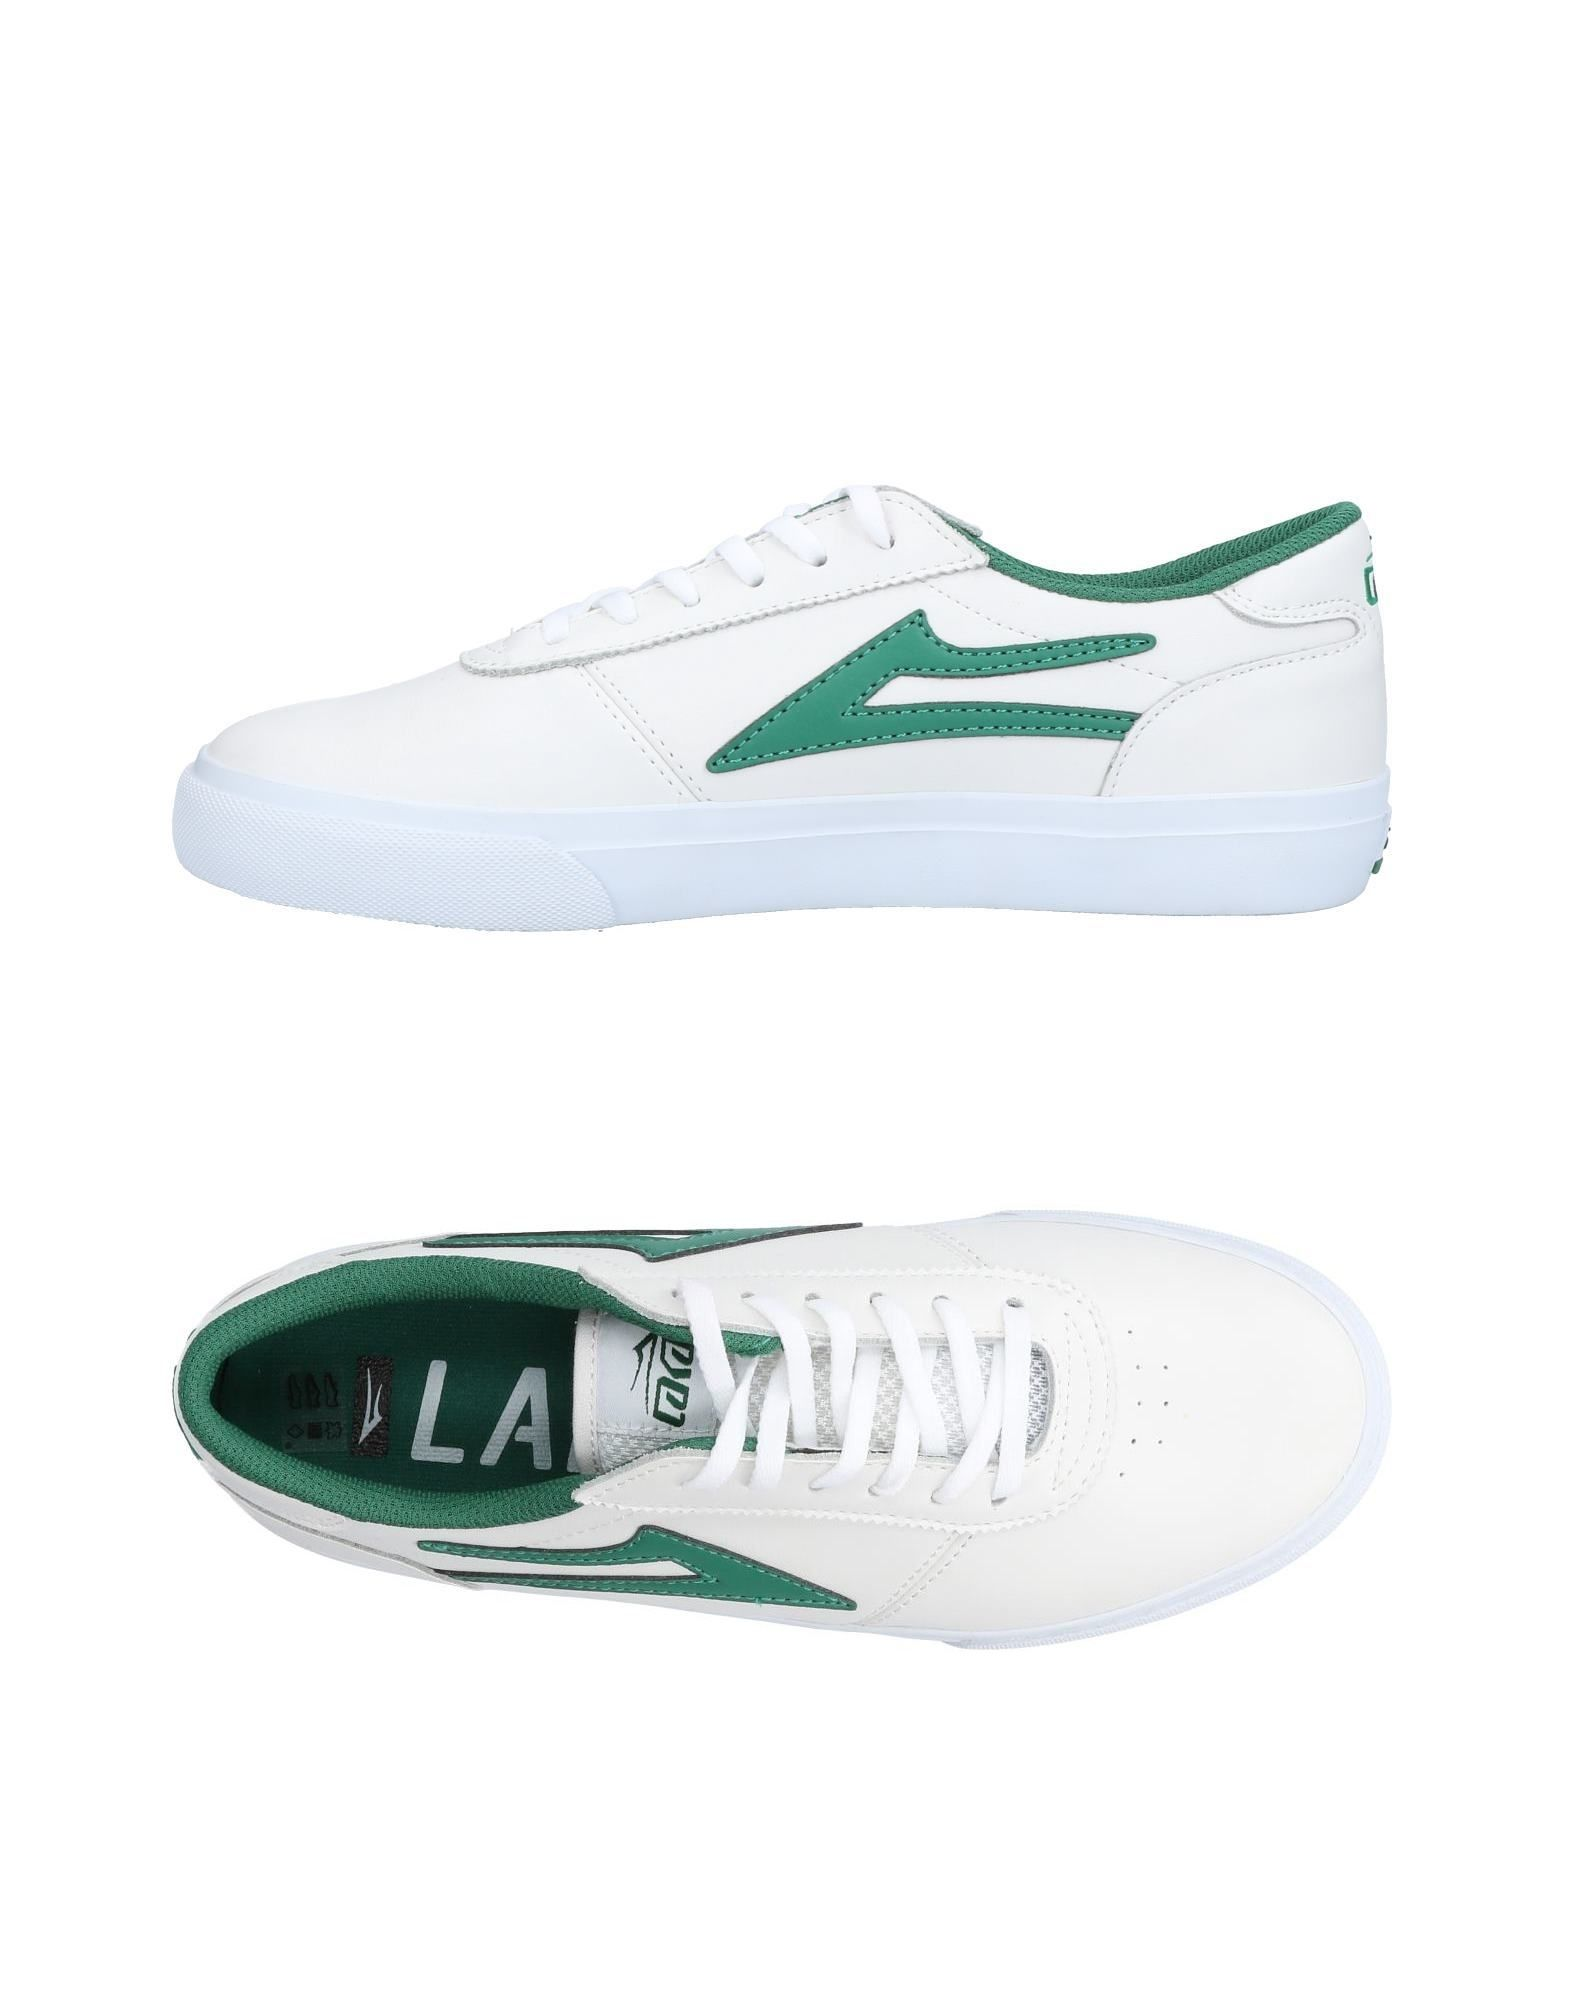 LAKAI Низкие кеды и кроссовки lakai lakai carrol white